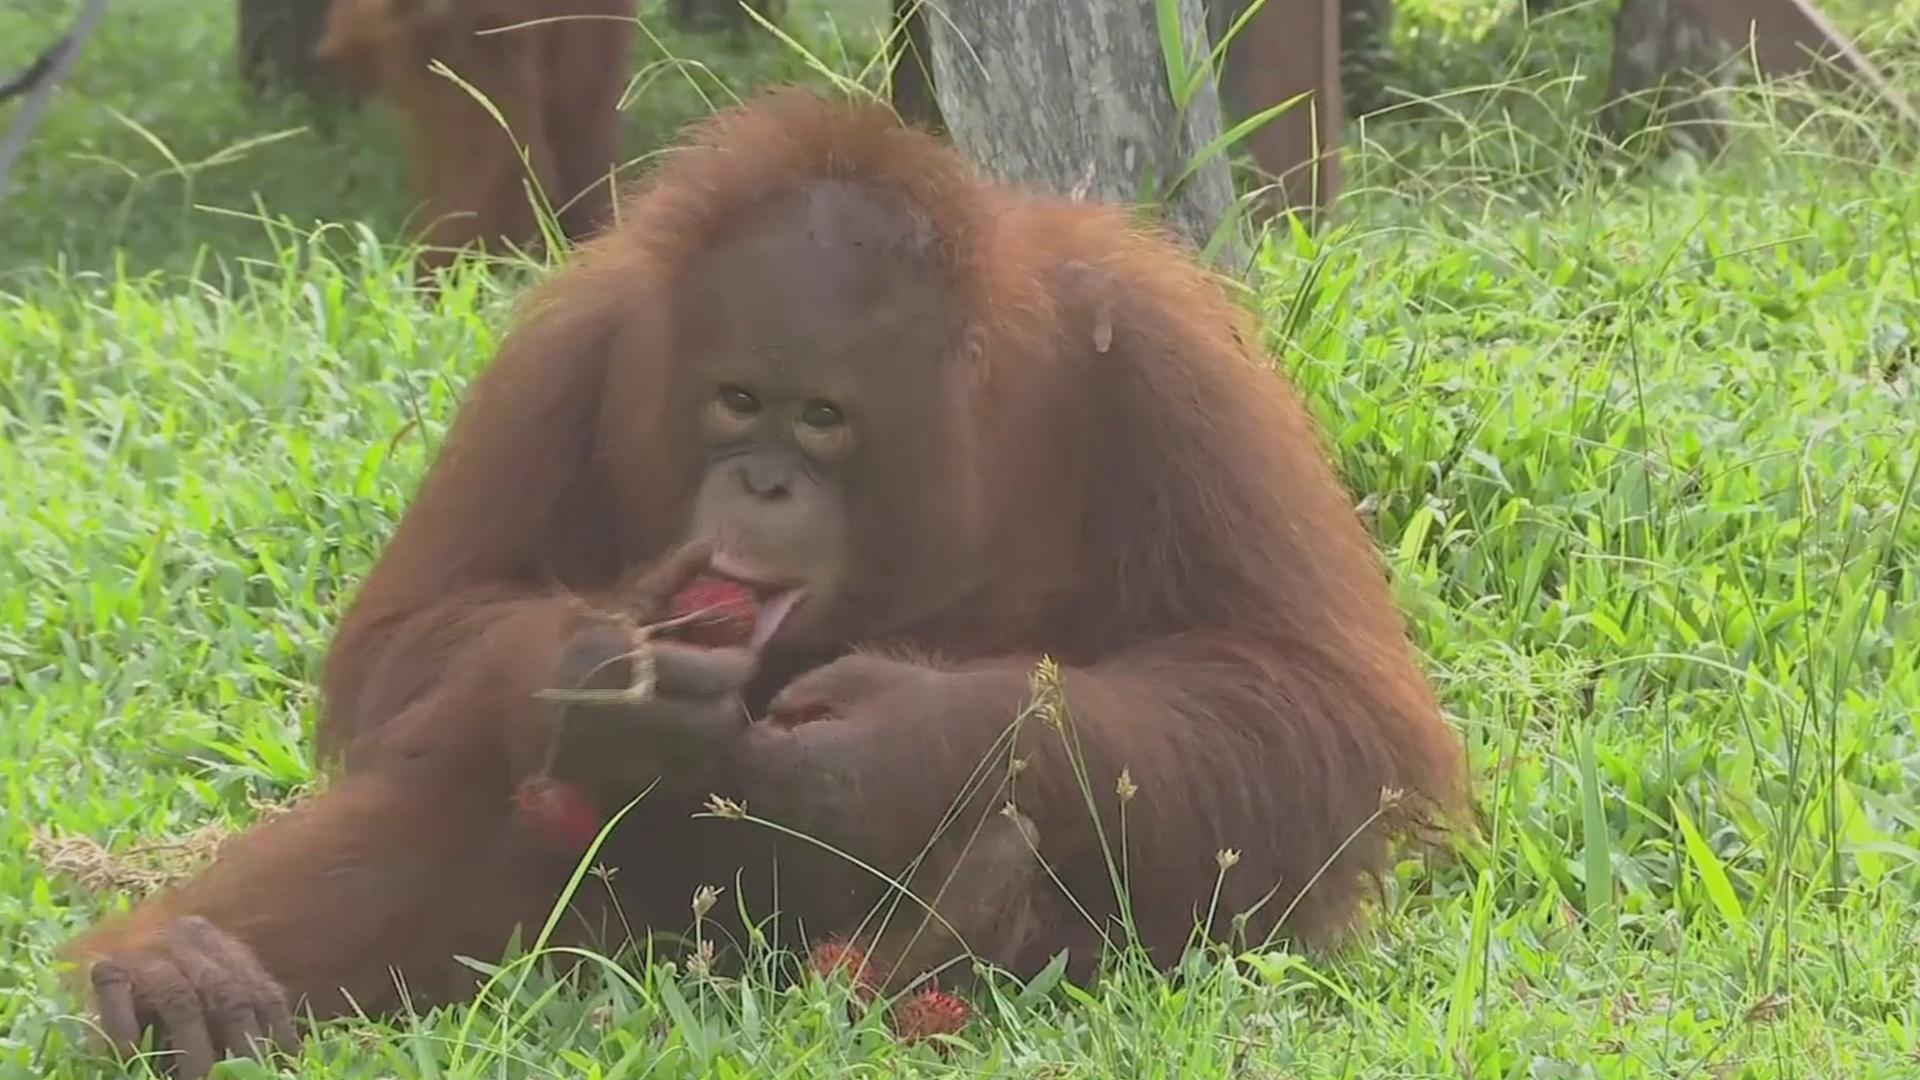 За редкими орангутанами наблюдают с помощью тепловизора